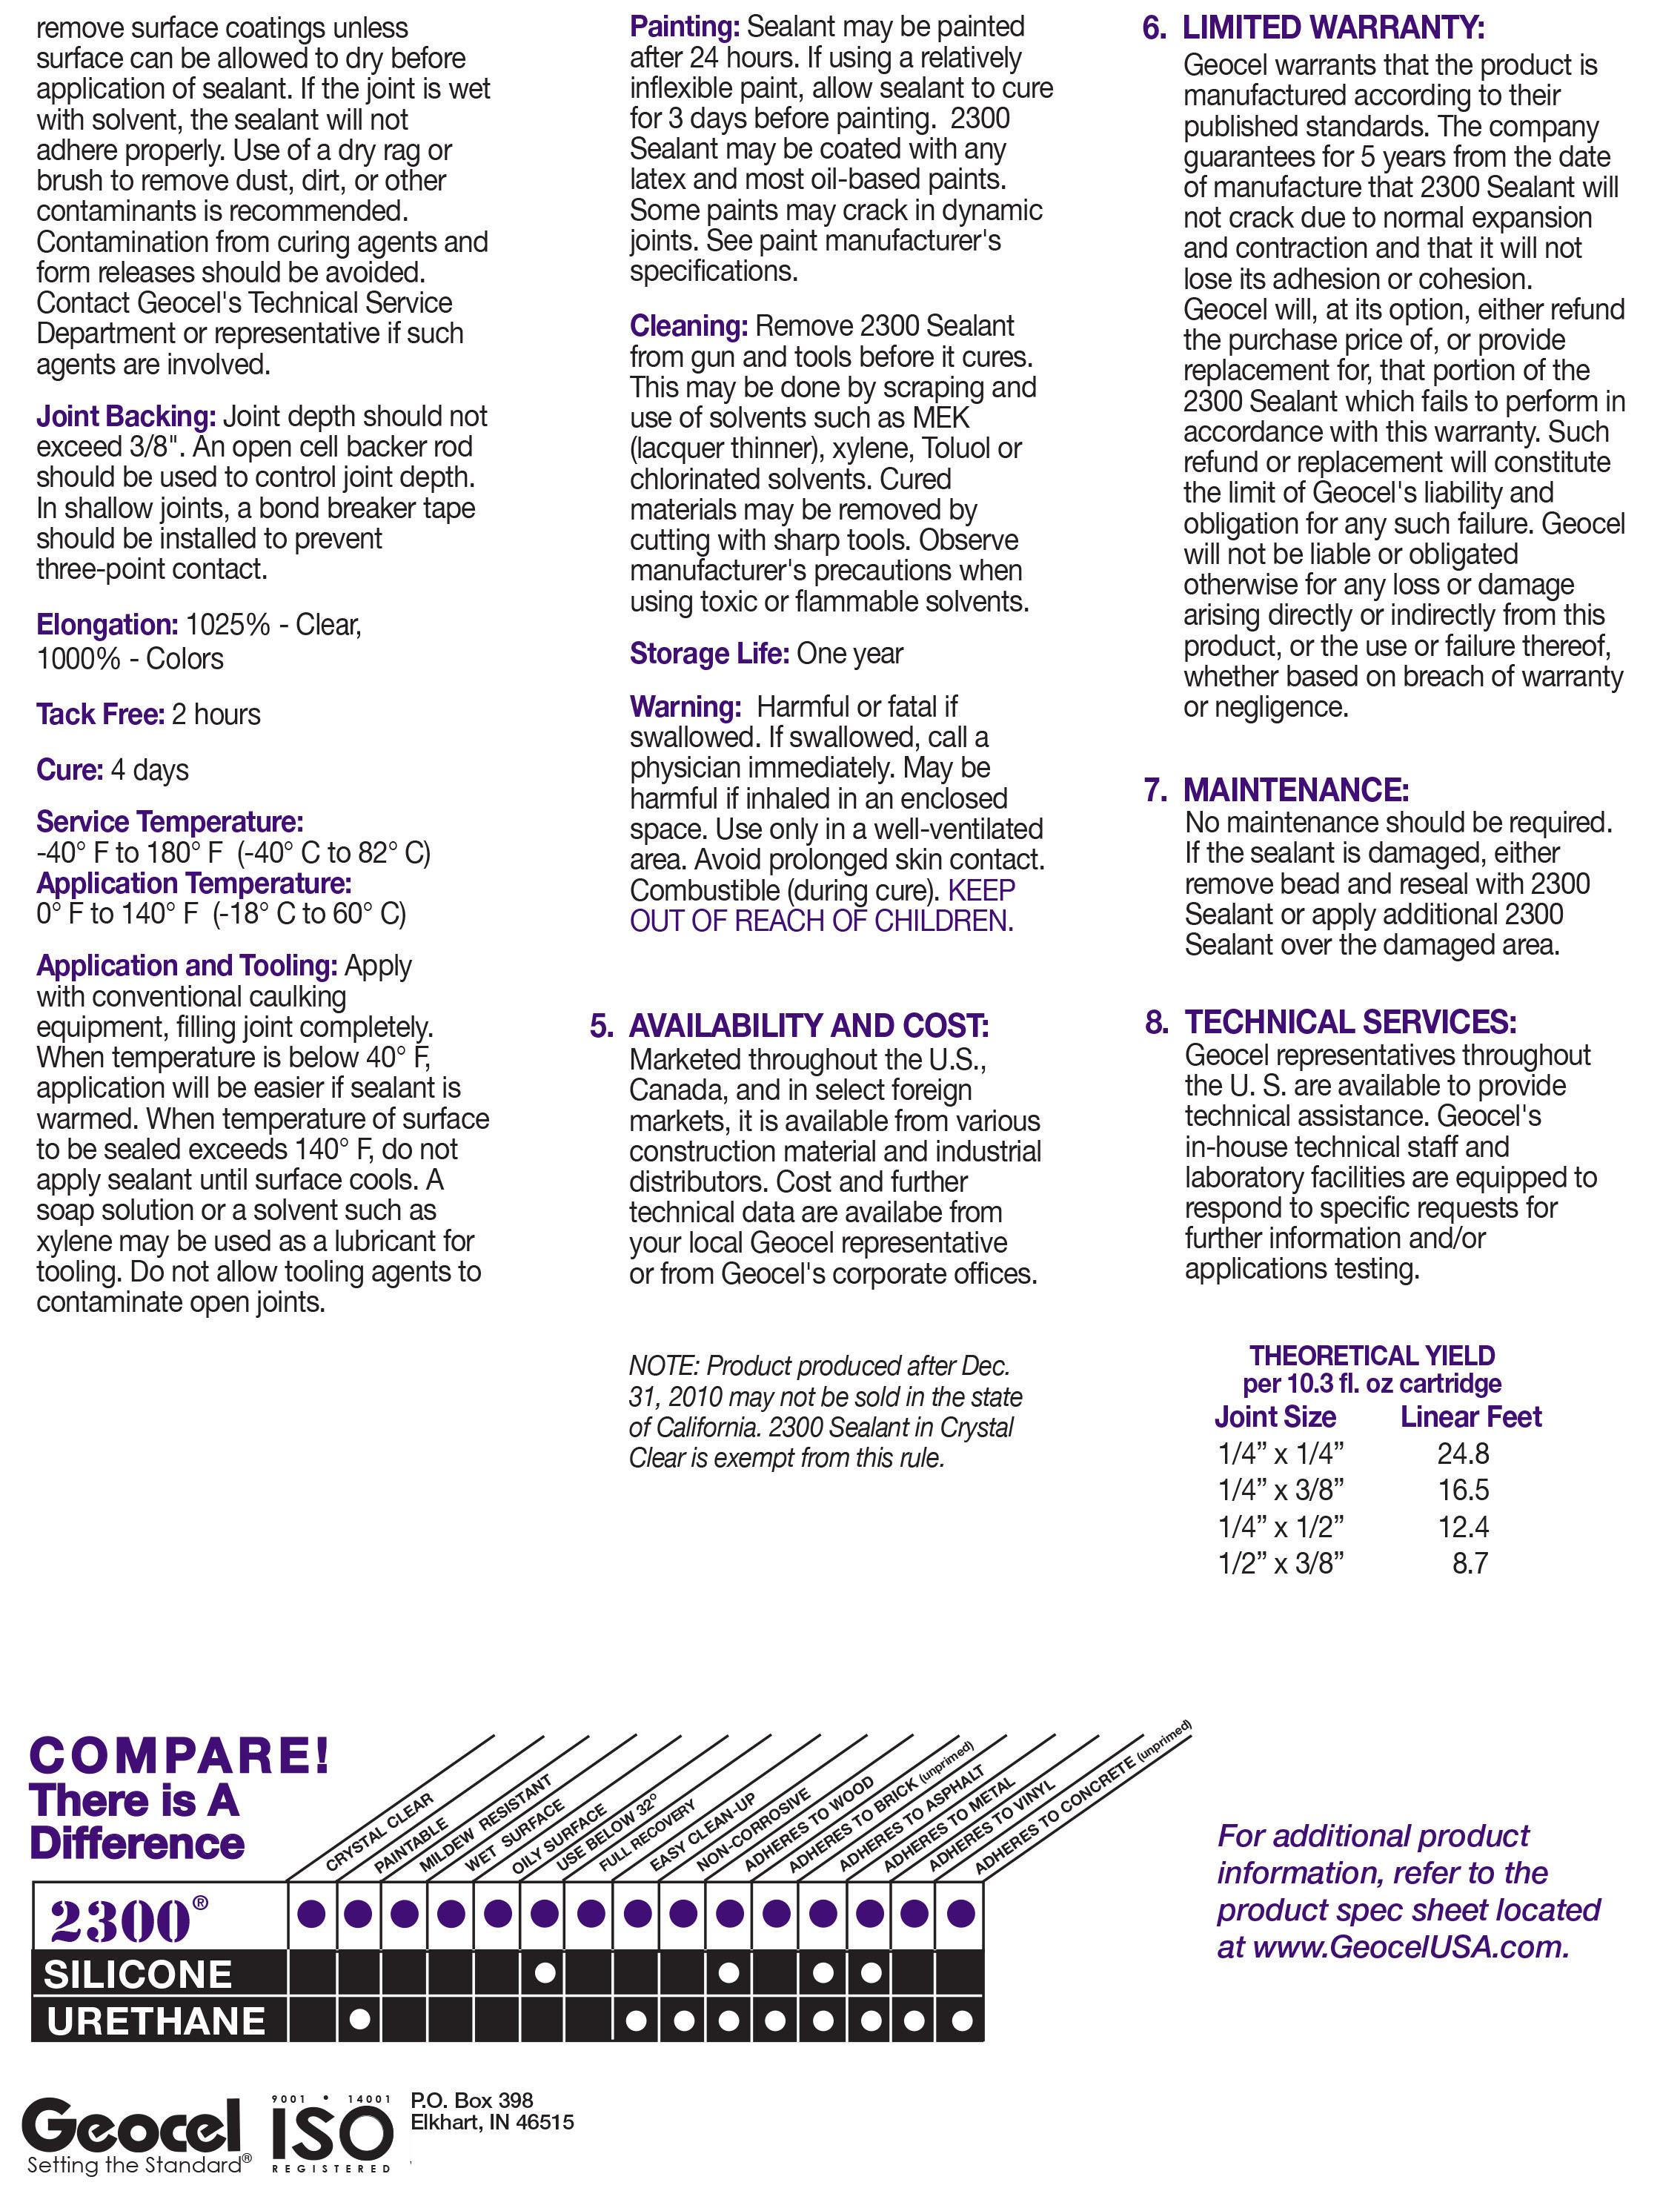 Geocel 2300 Construction Tripolymer Sealant - Chargar Corp